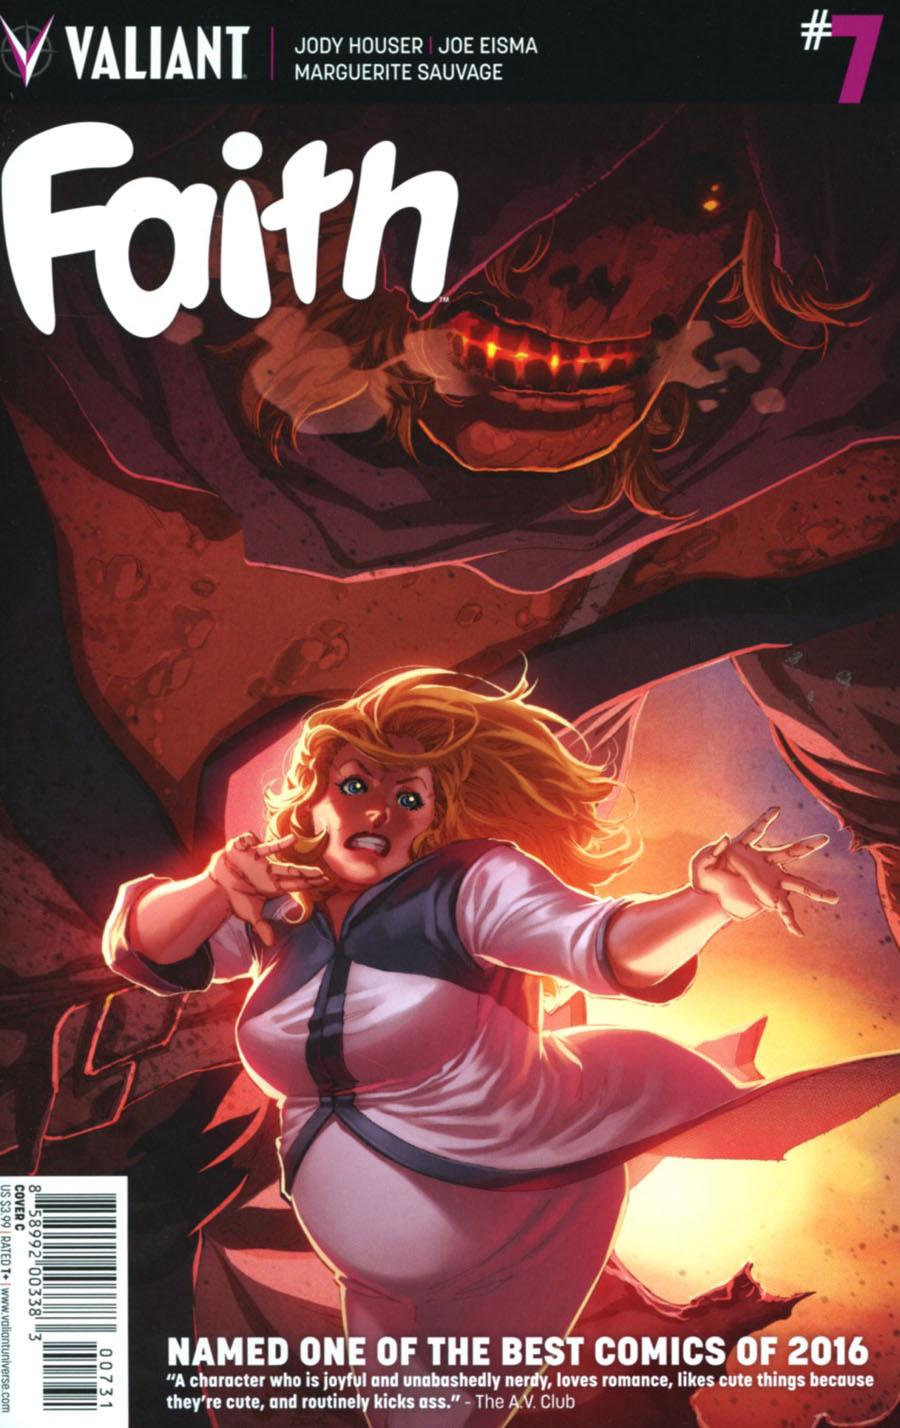 Faith (Valiant Entertainment) Vol 2 #7 Cover C Variant Philip Tan Cover